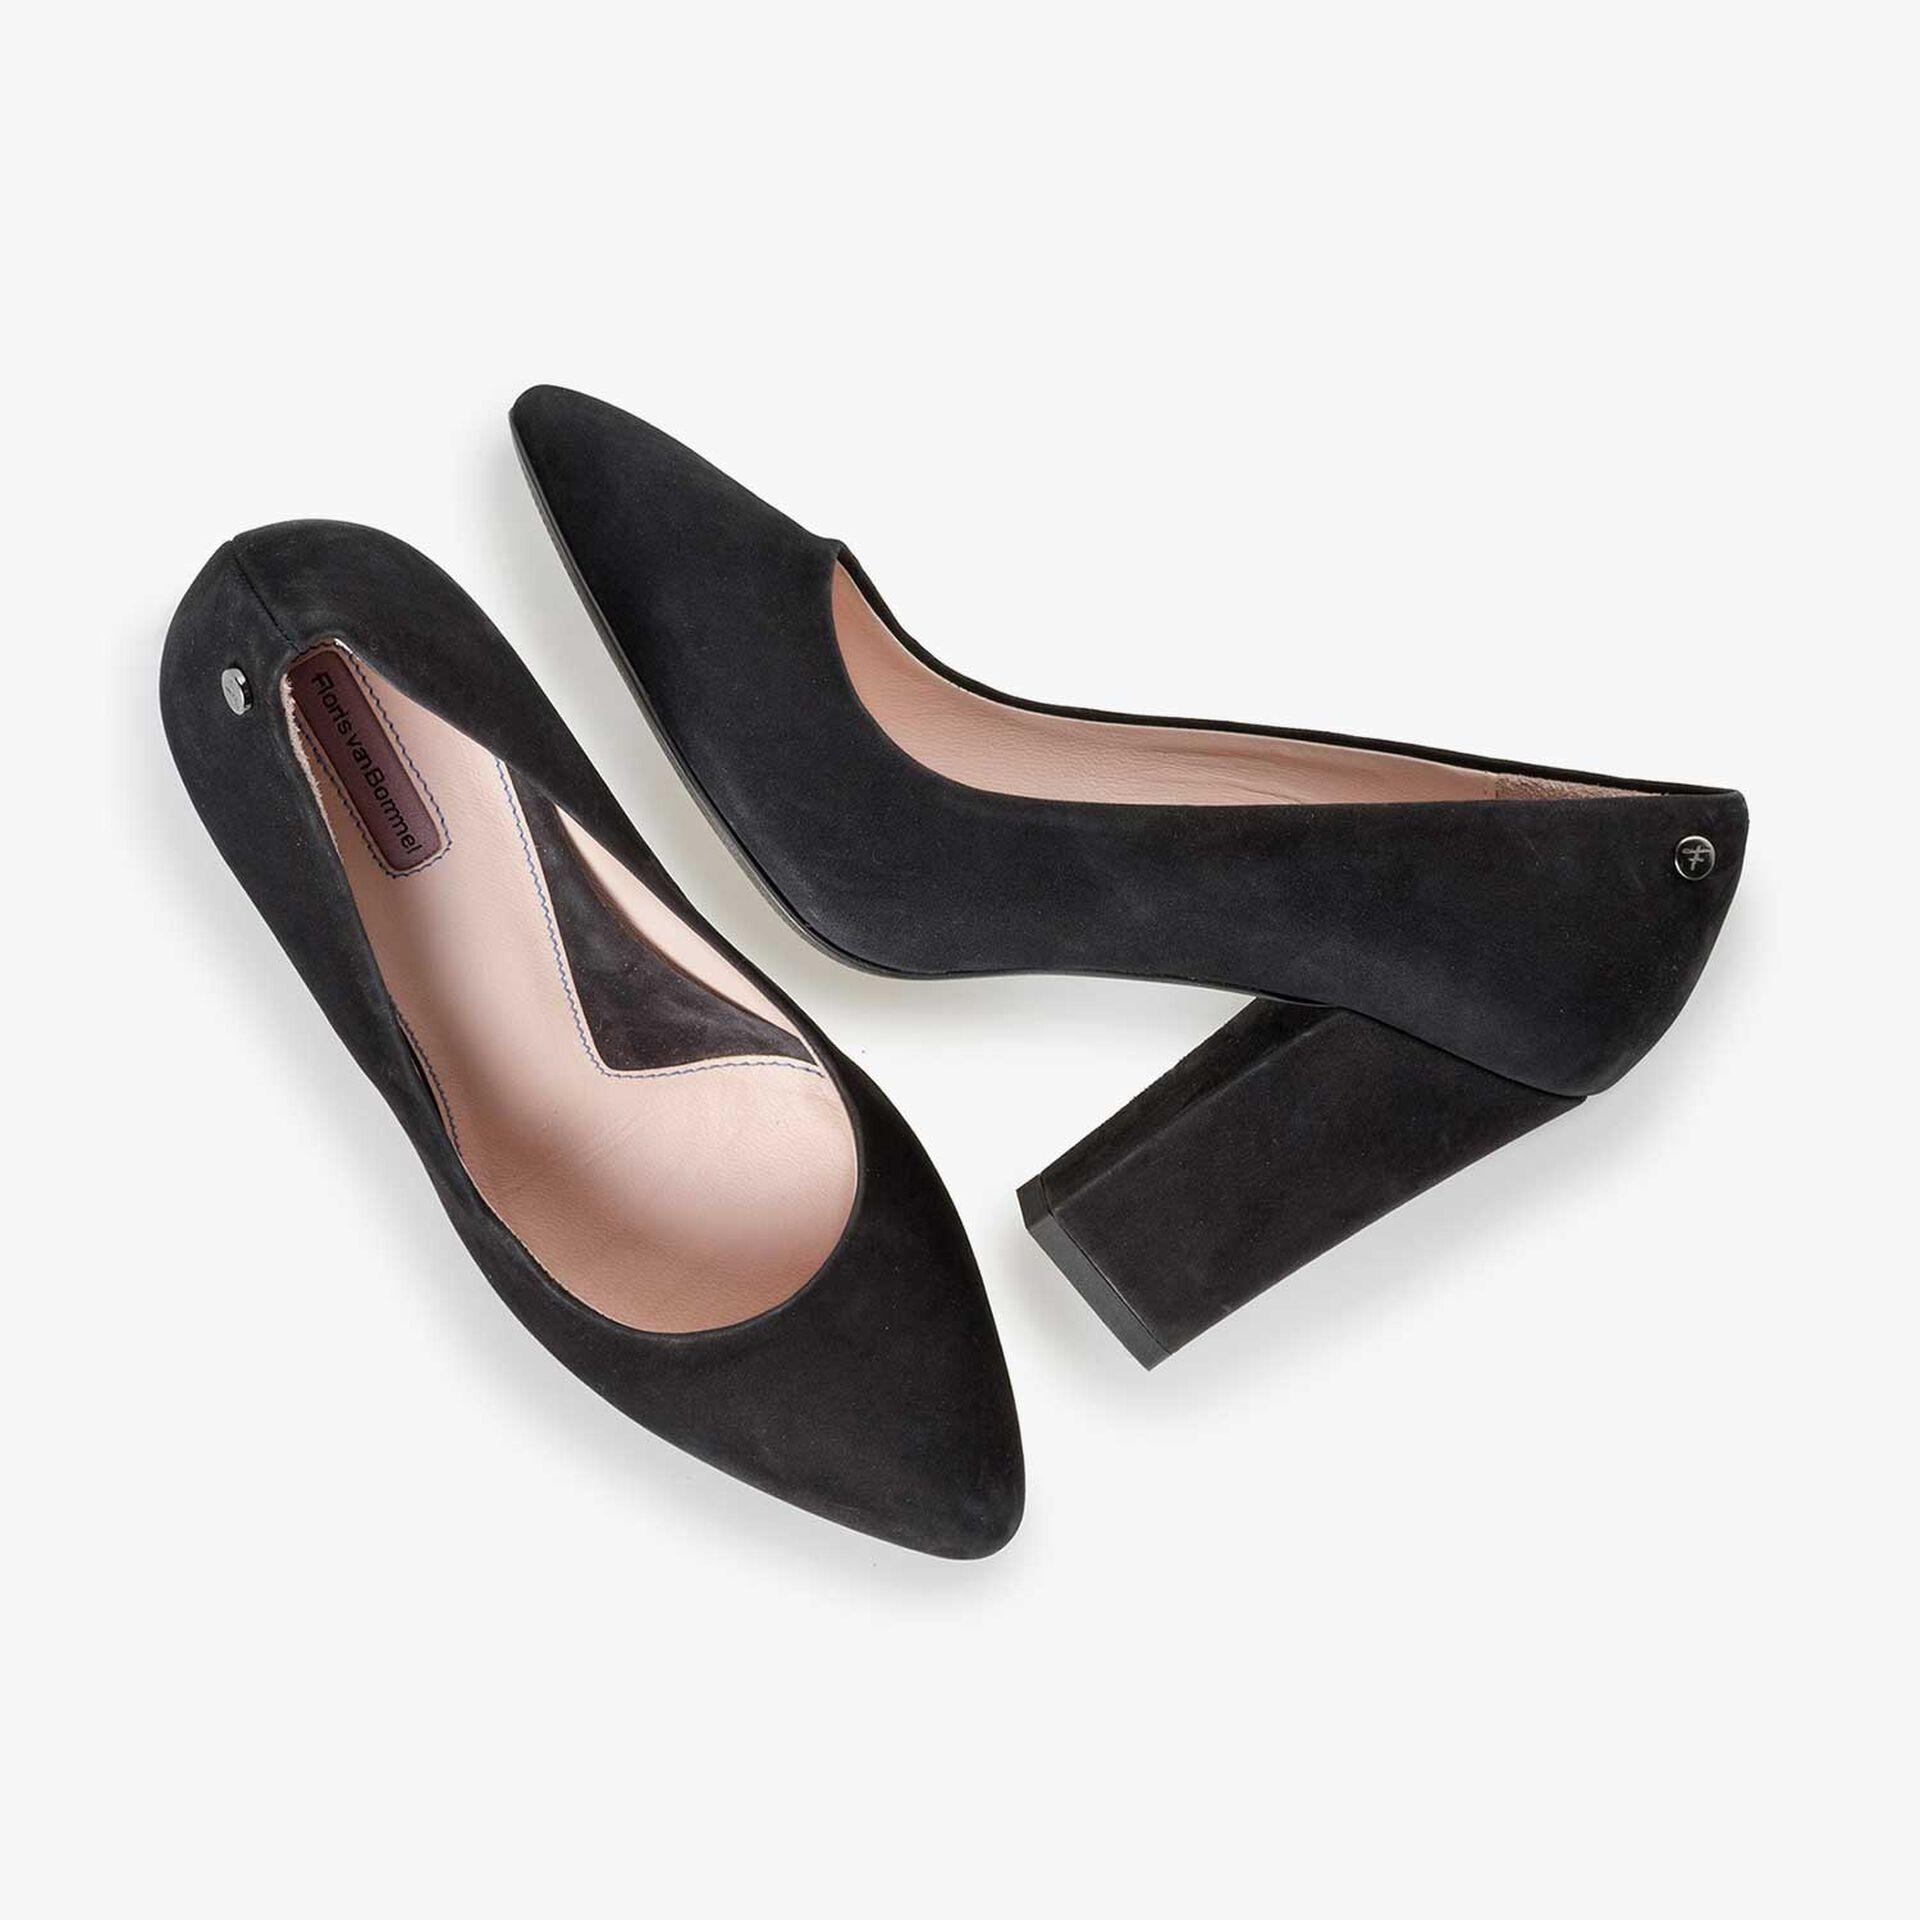 Black nubuck leather high heels